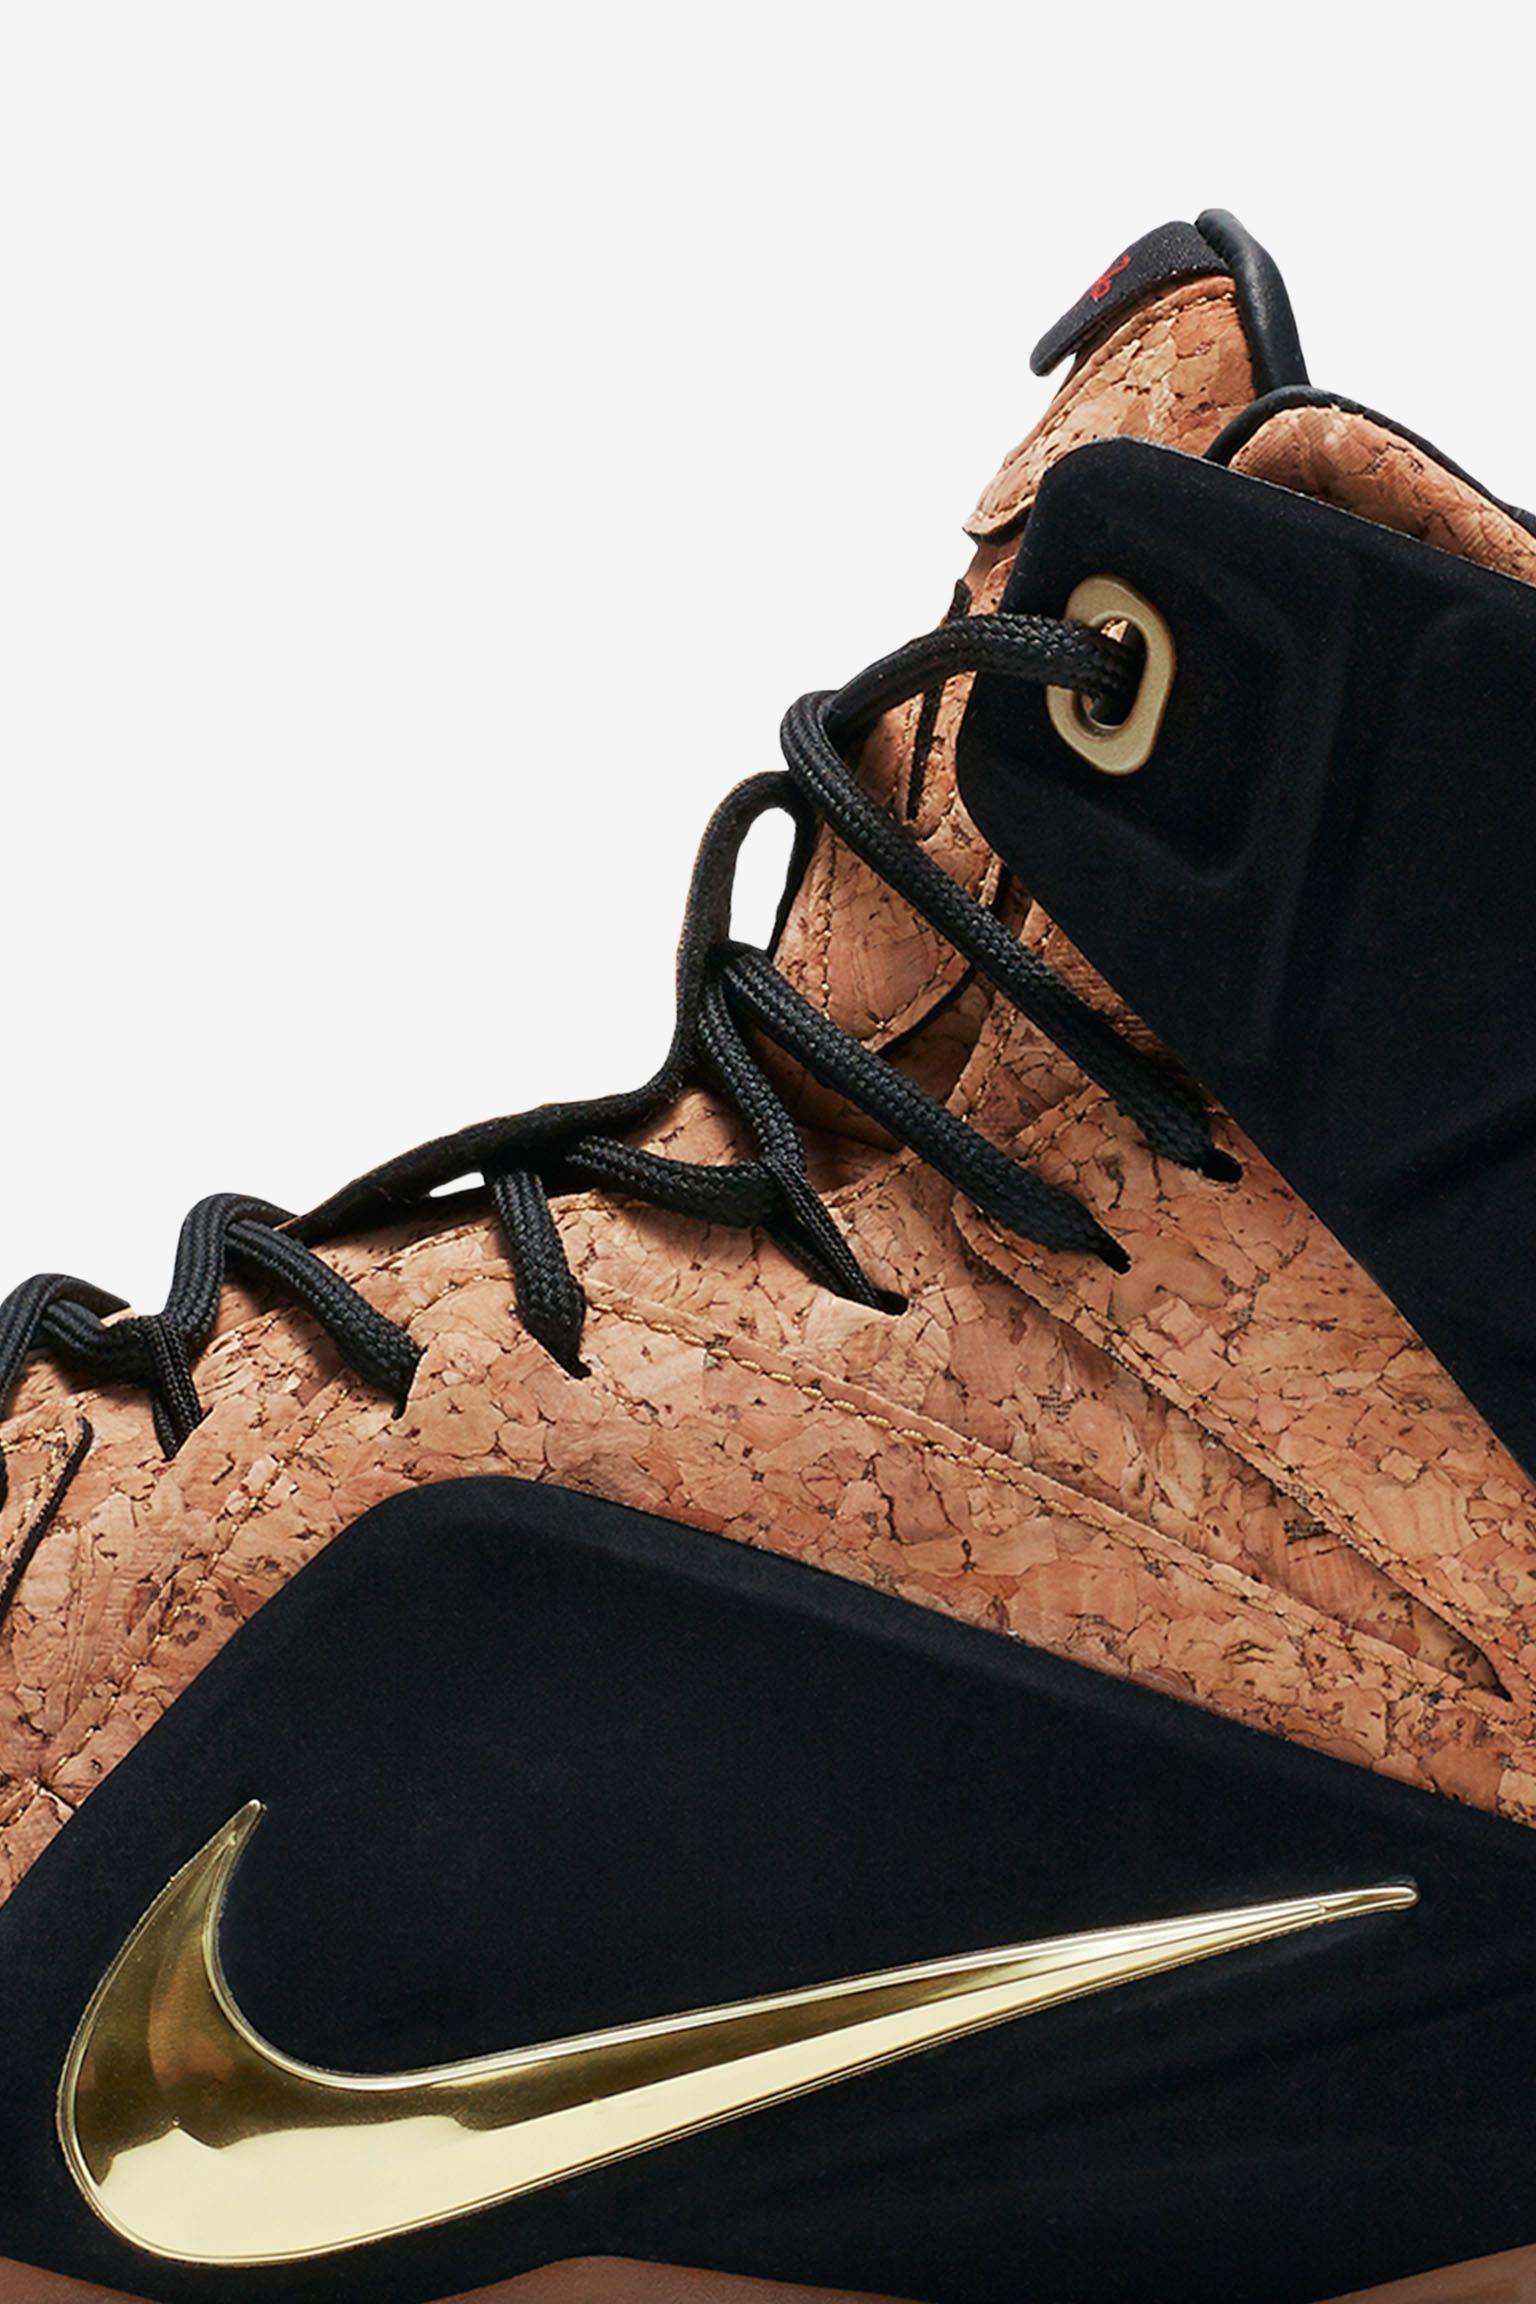 Nike LeBron 12 EXT Kings 'Cork'